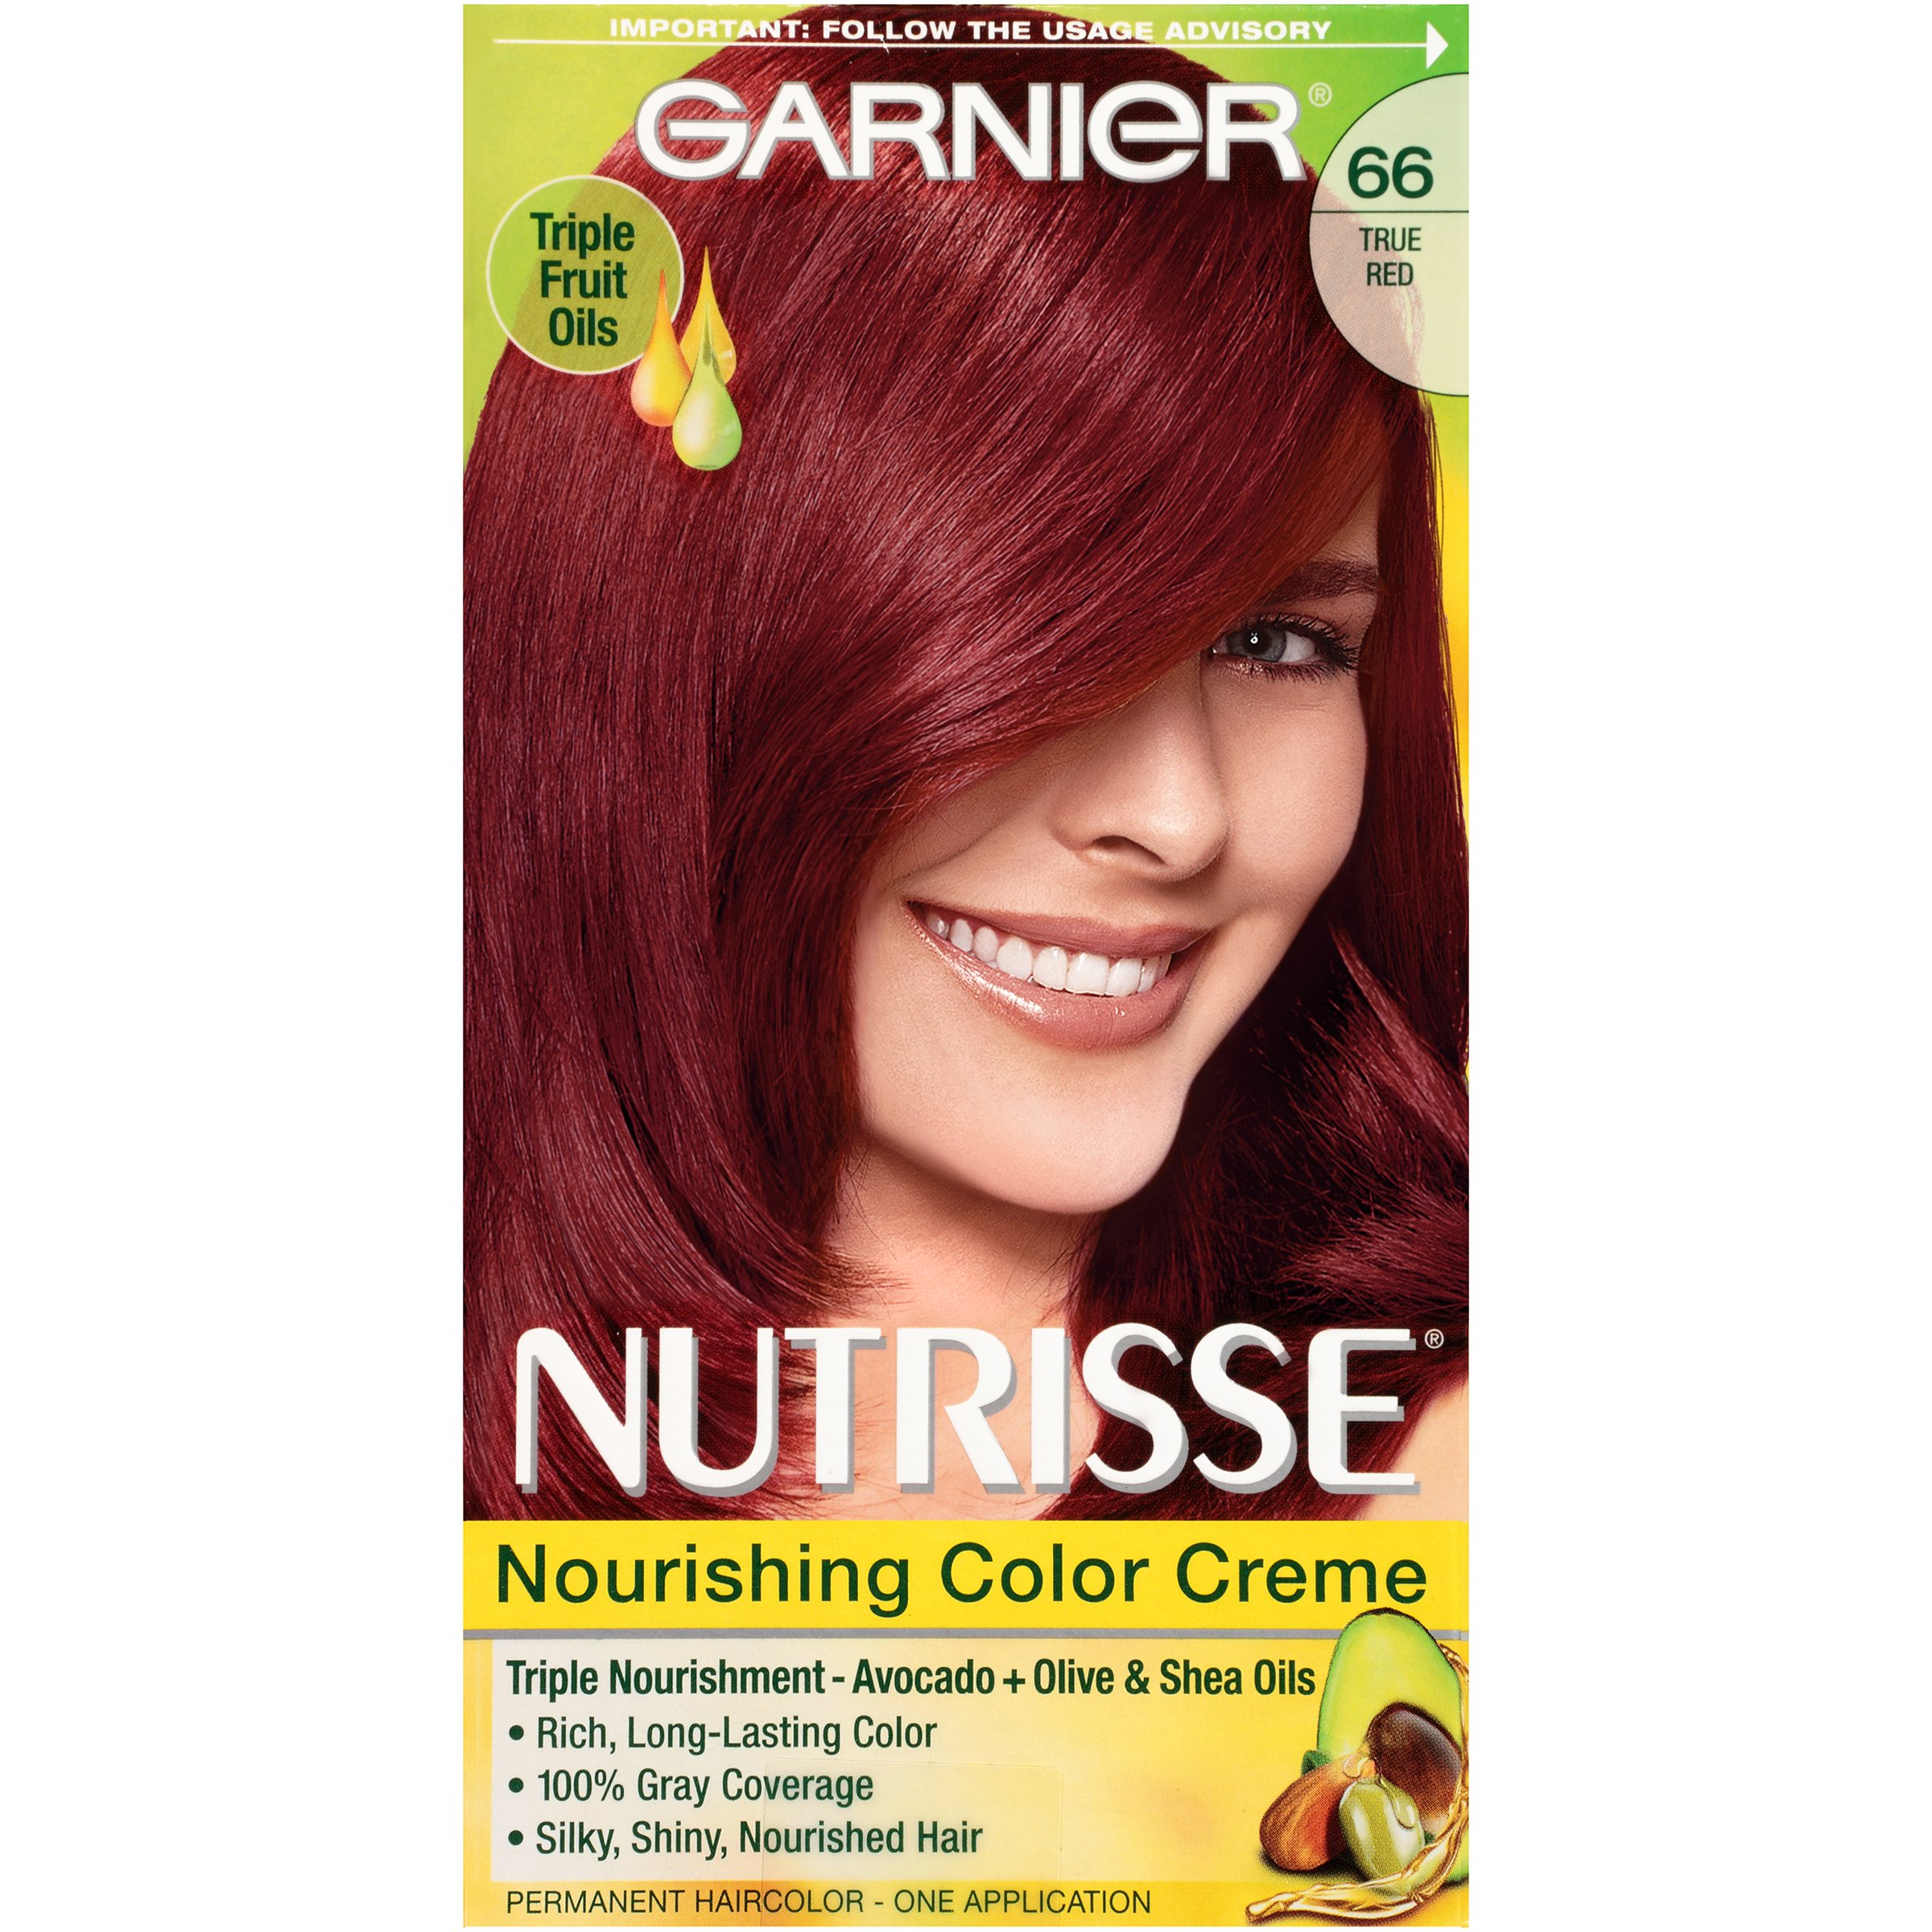 Cheap Garnier Hair Color Red Find Garnier Hair Color Red Deals On